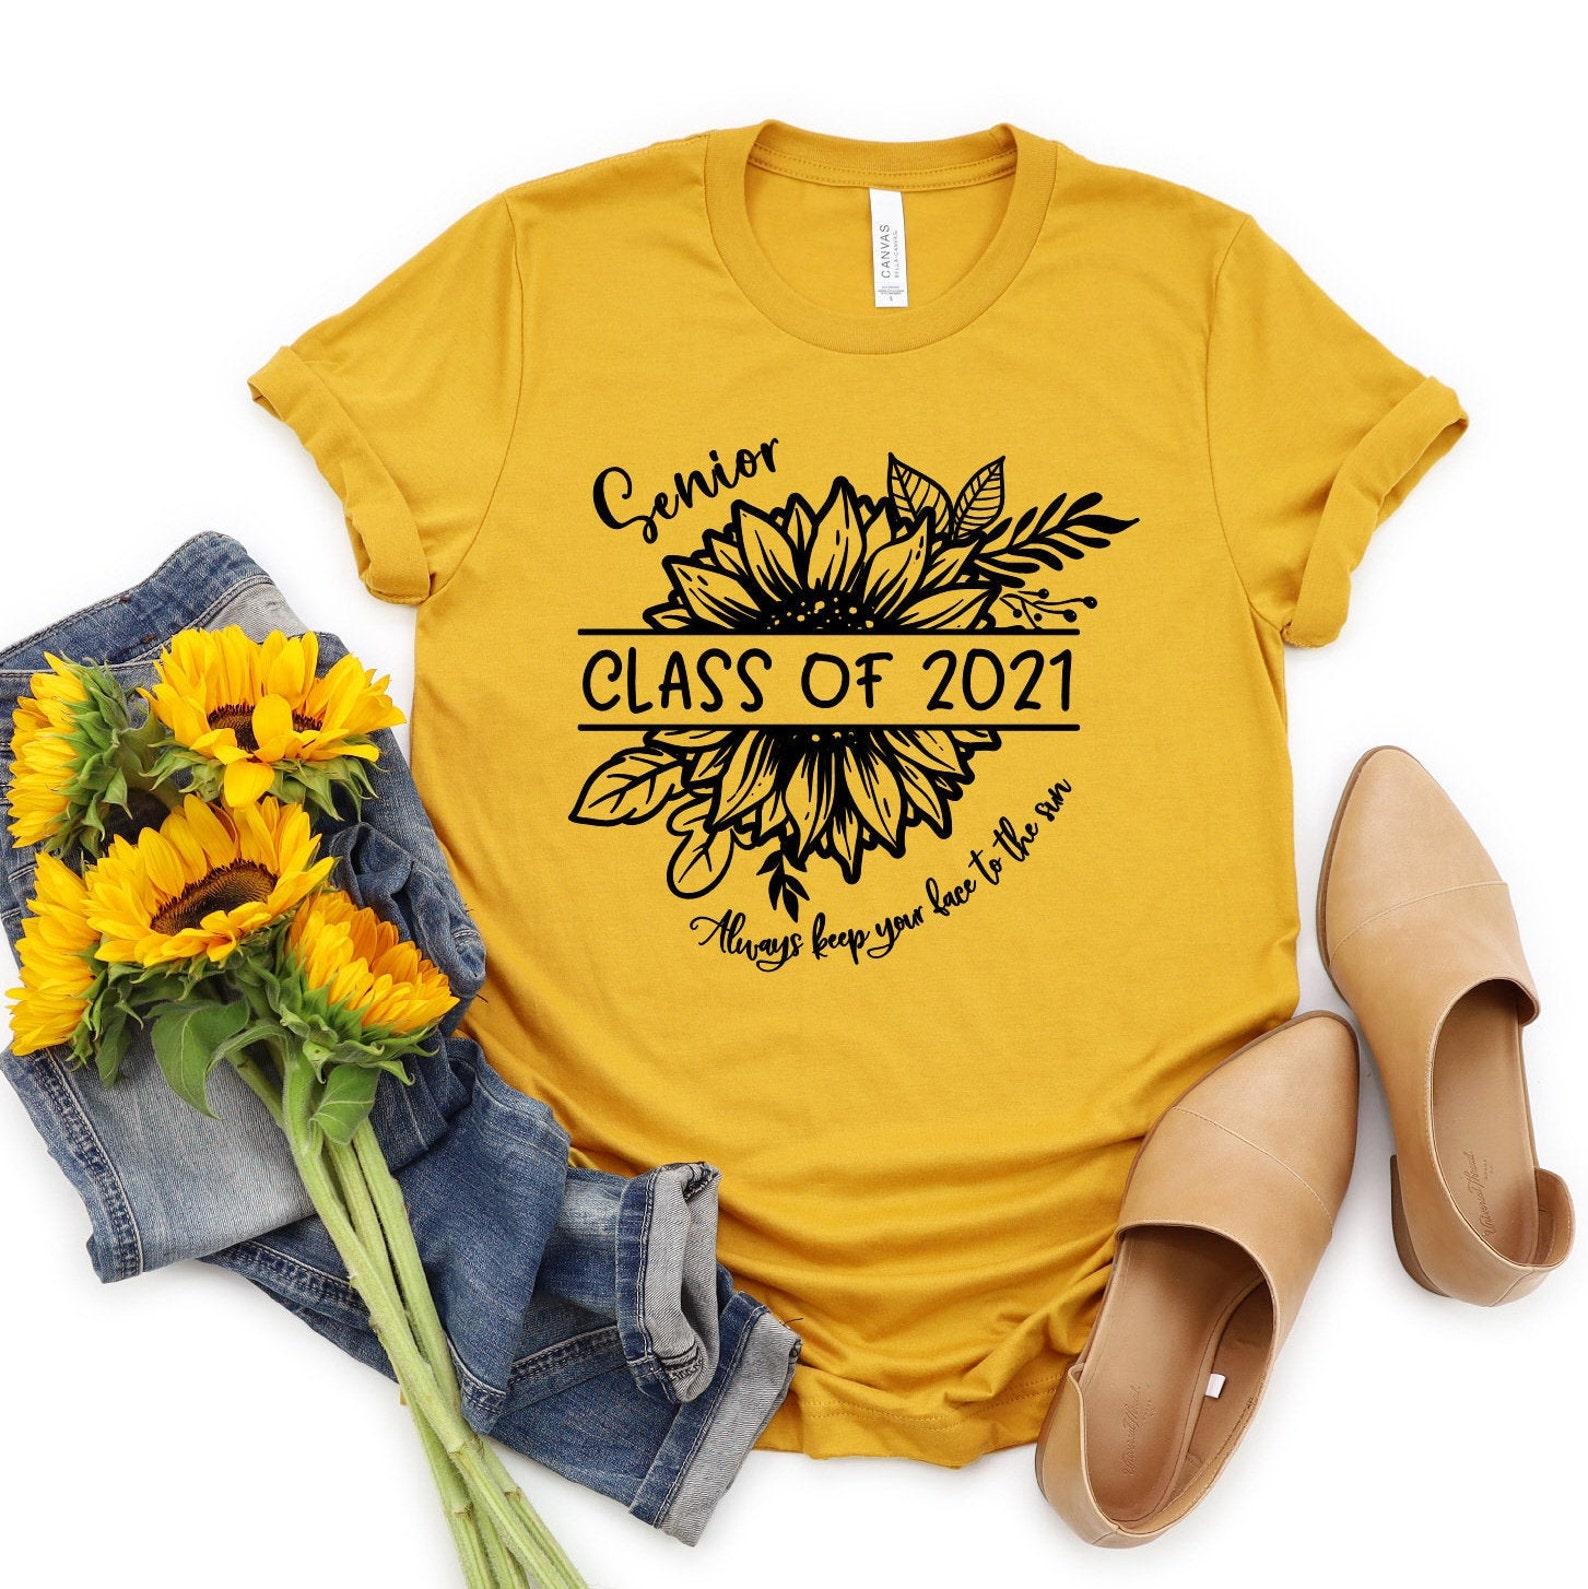 Senior 2021 Shirt Sunflower T Shirt Class Of 2021   Etsy